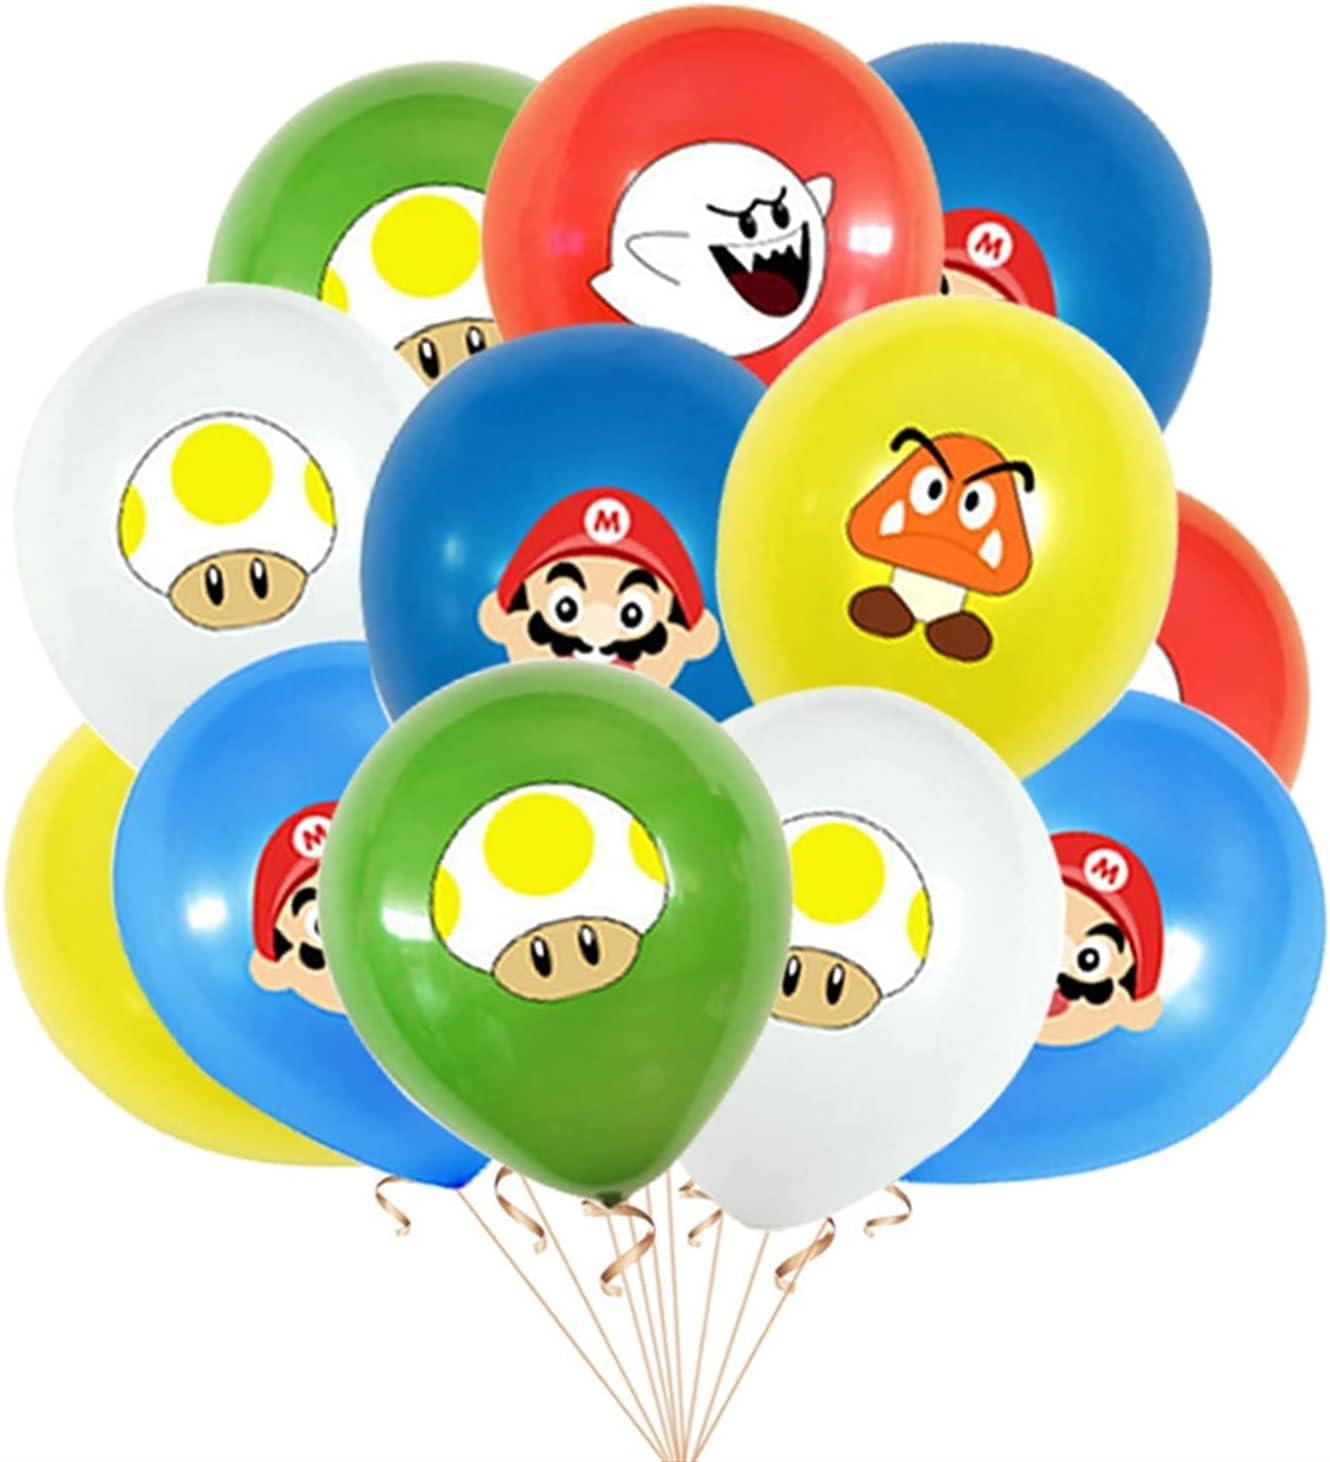 Cartoon Balloon Charlotte Mall 12pcs Bag 12inch Maker Air Latex Elegant Gl Game